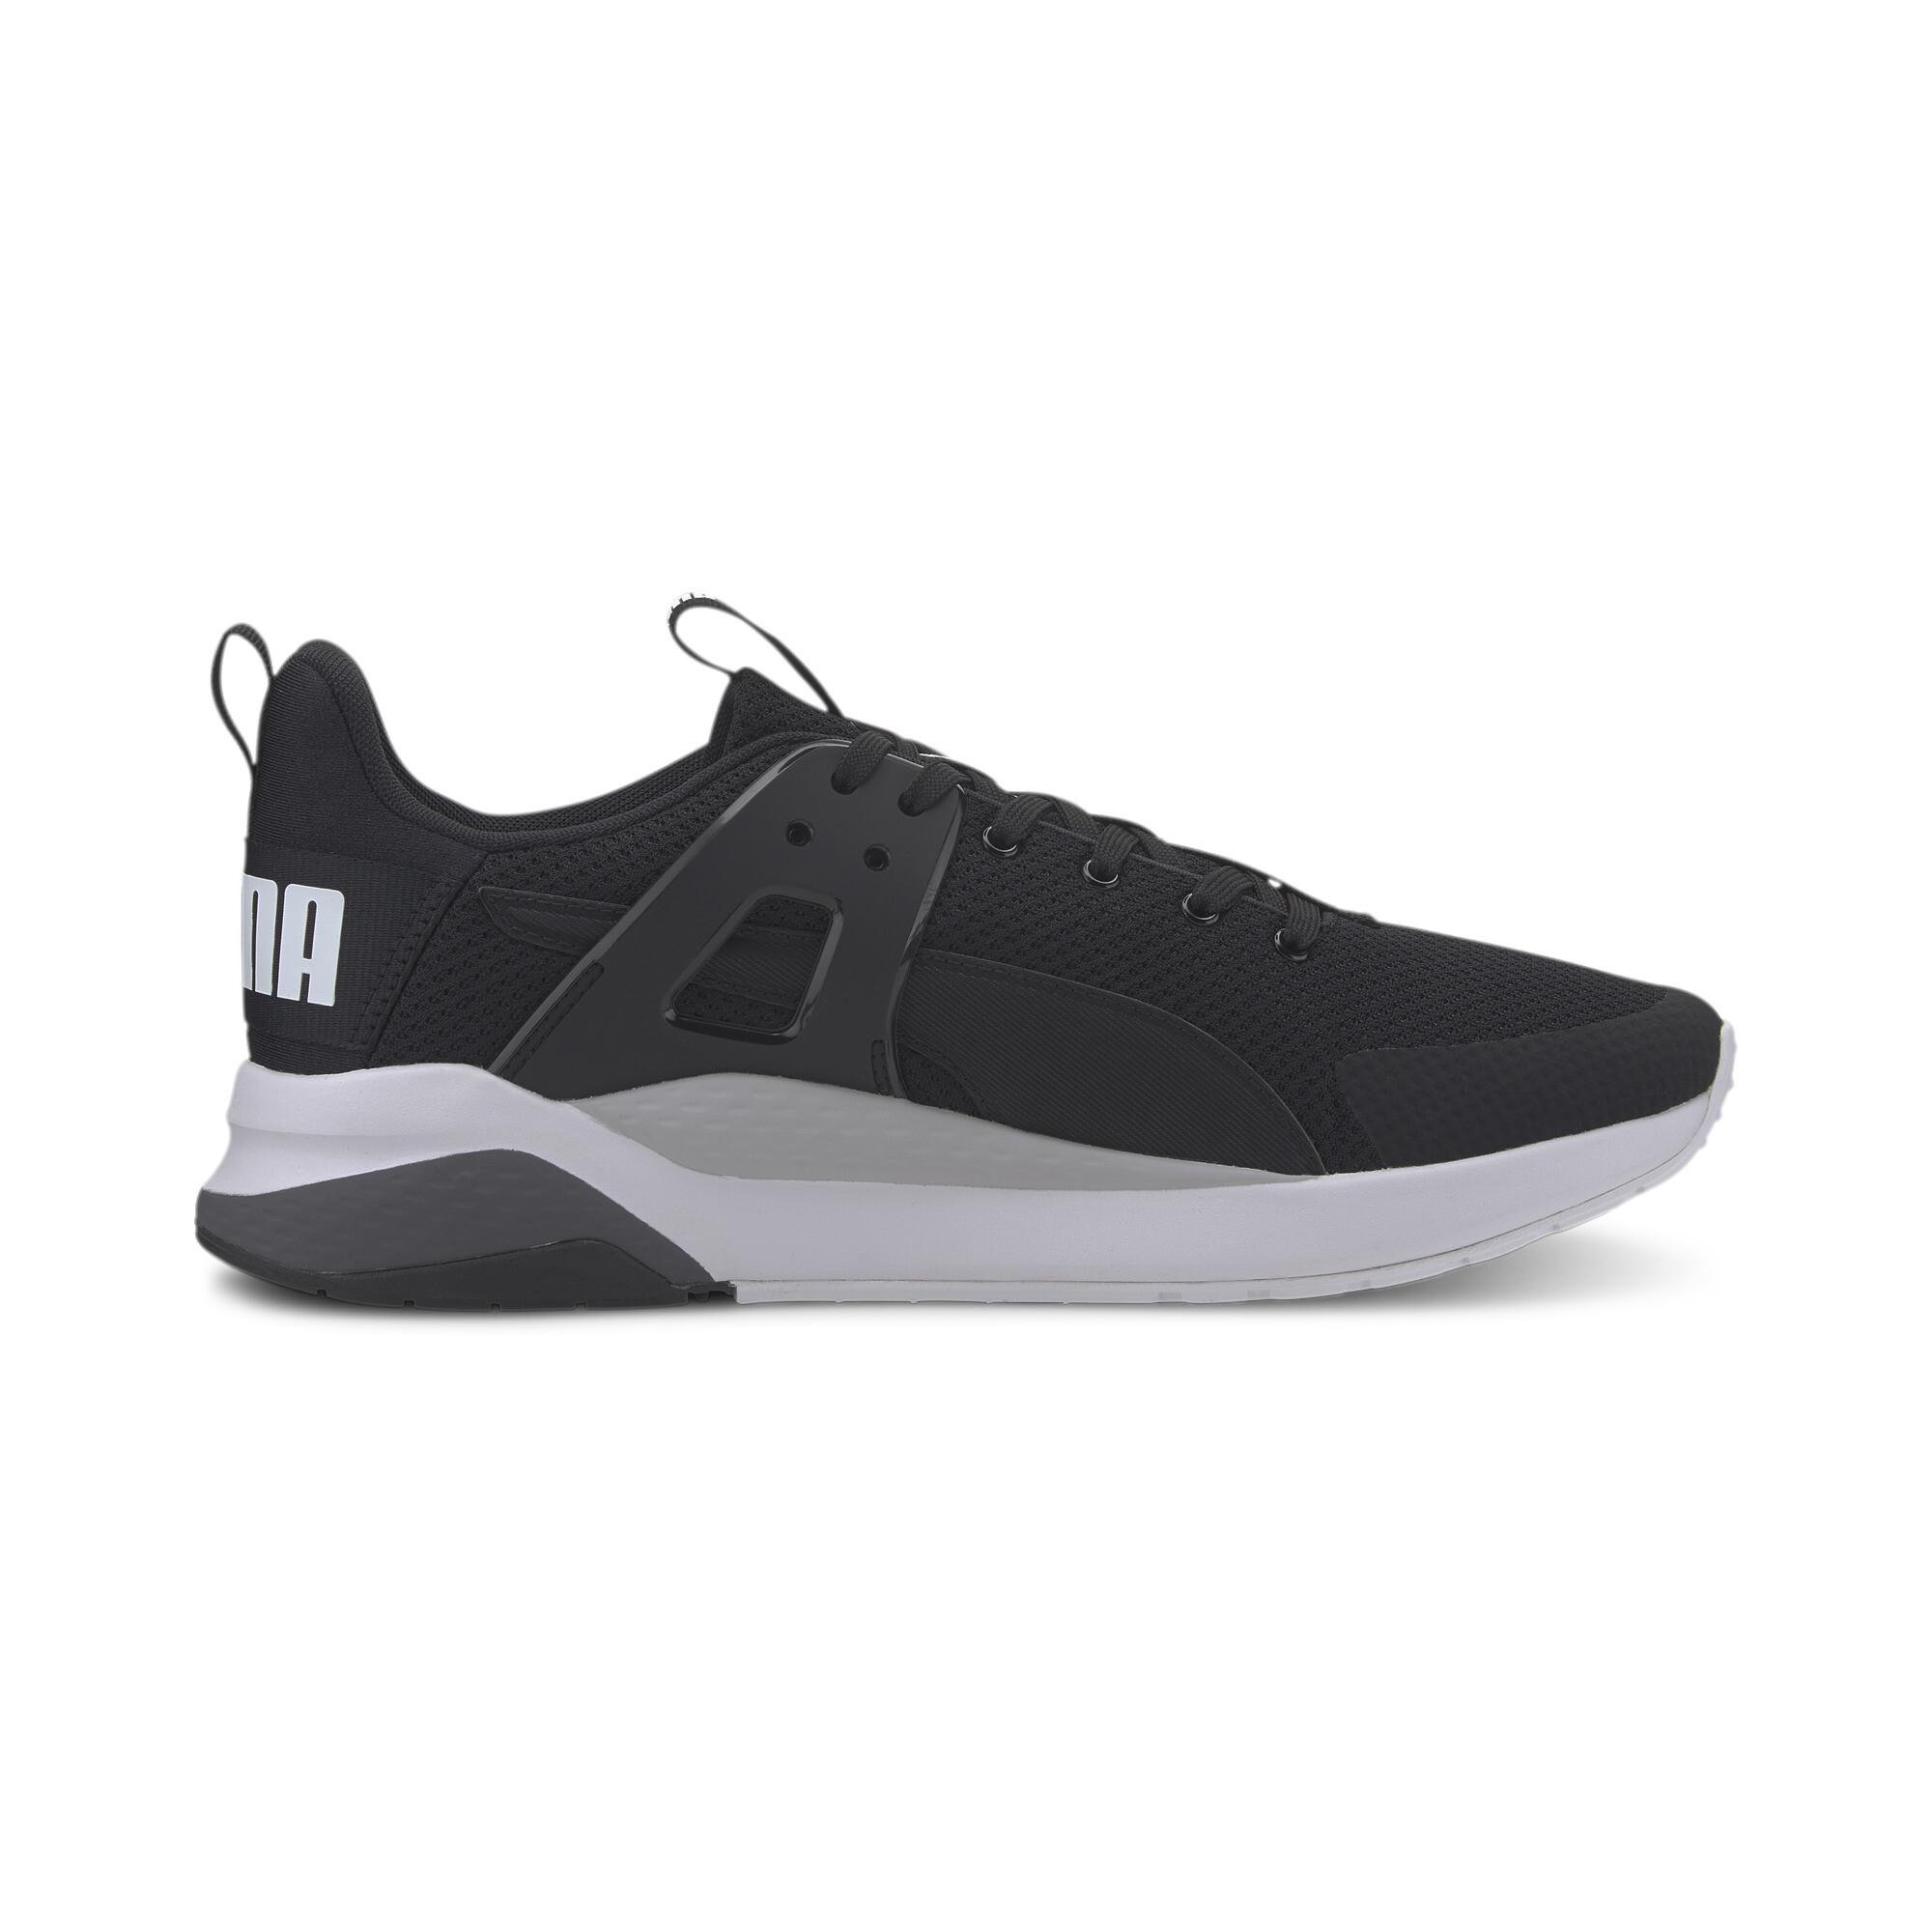 thumbnail 13 - PUMA-Men-039-s-Anzarun-Cage-Sneakers